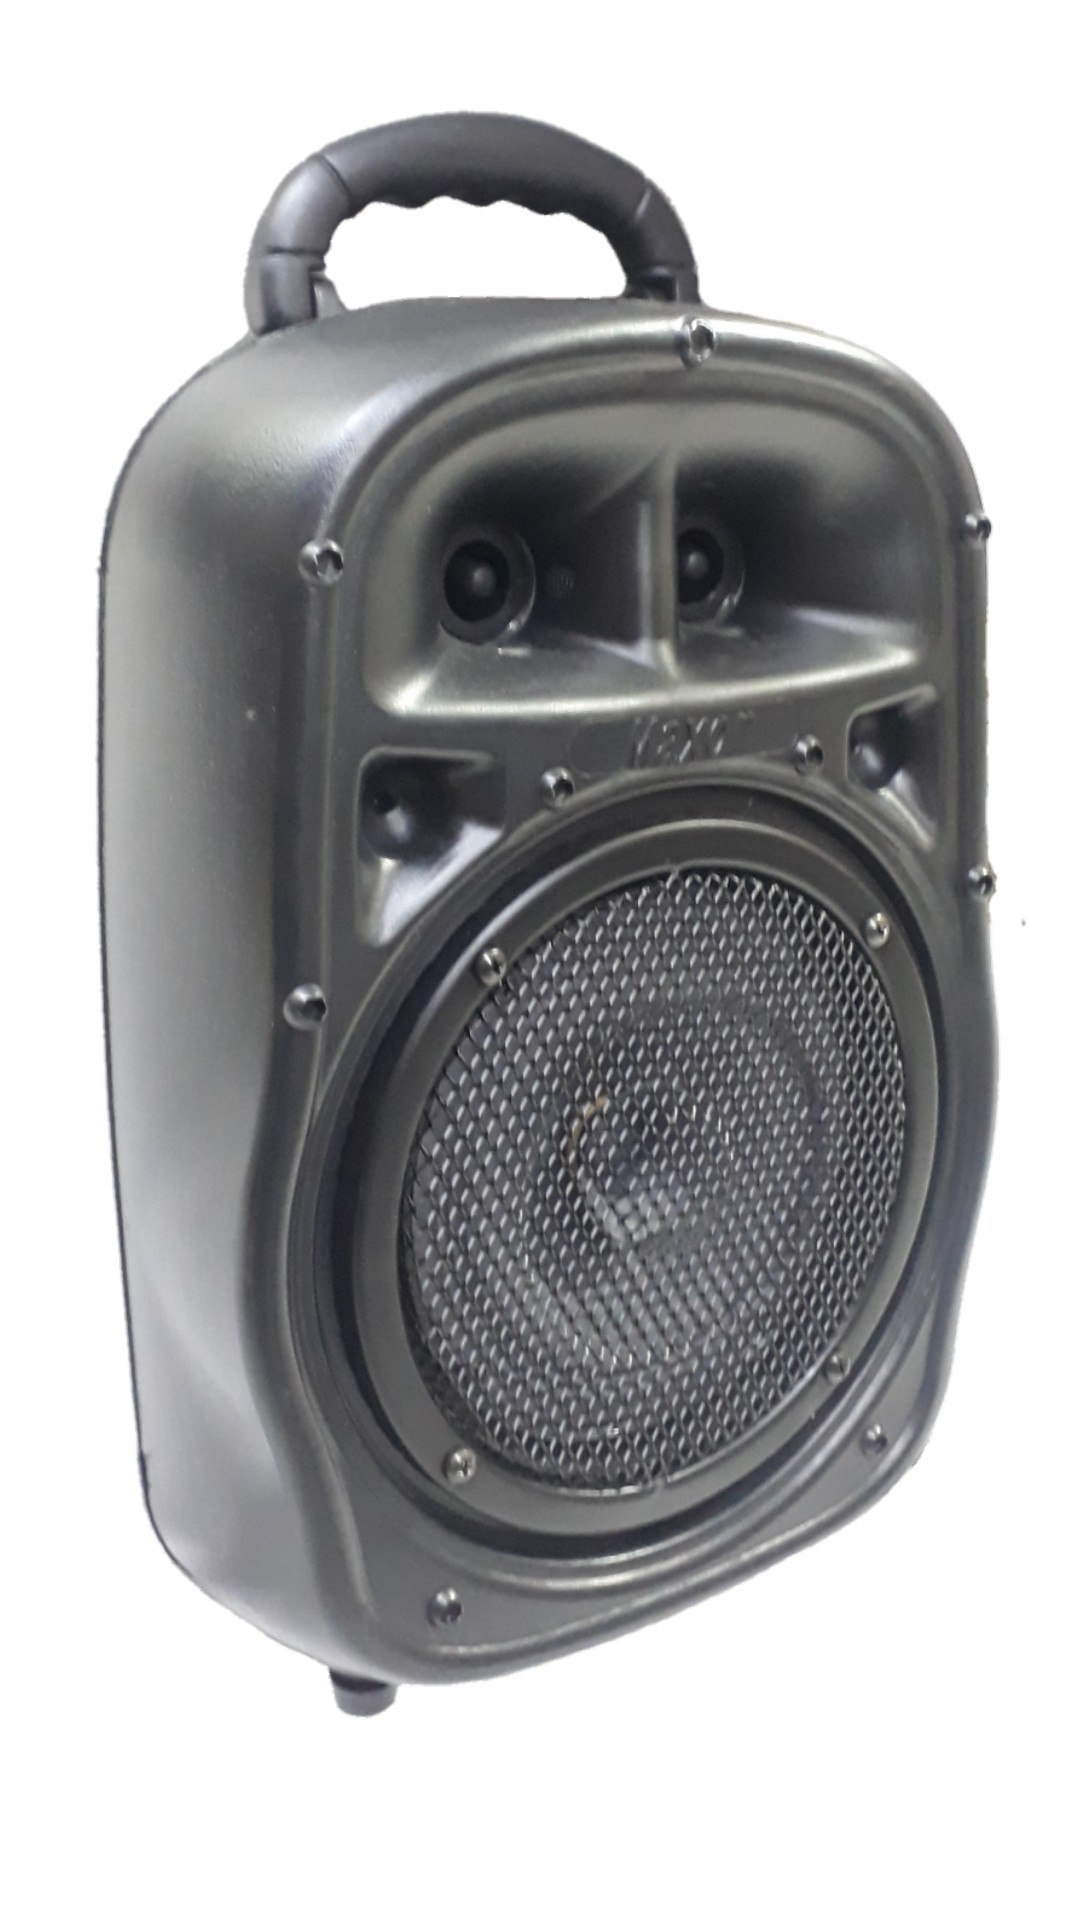 Caixa Amplificada Surtech Pe8 Turbinada Blu.Usb/Sd/Fm Falante6seco, 3canais N15.Eco Controle Remoto,Ativa Reversor Alimenta Passiva258wre